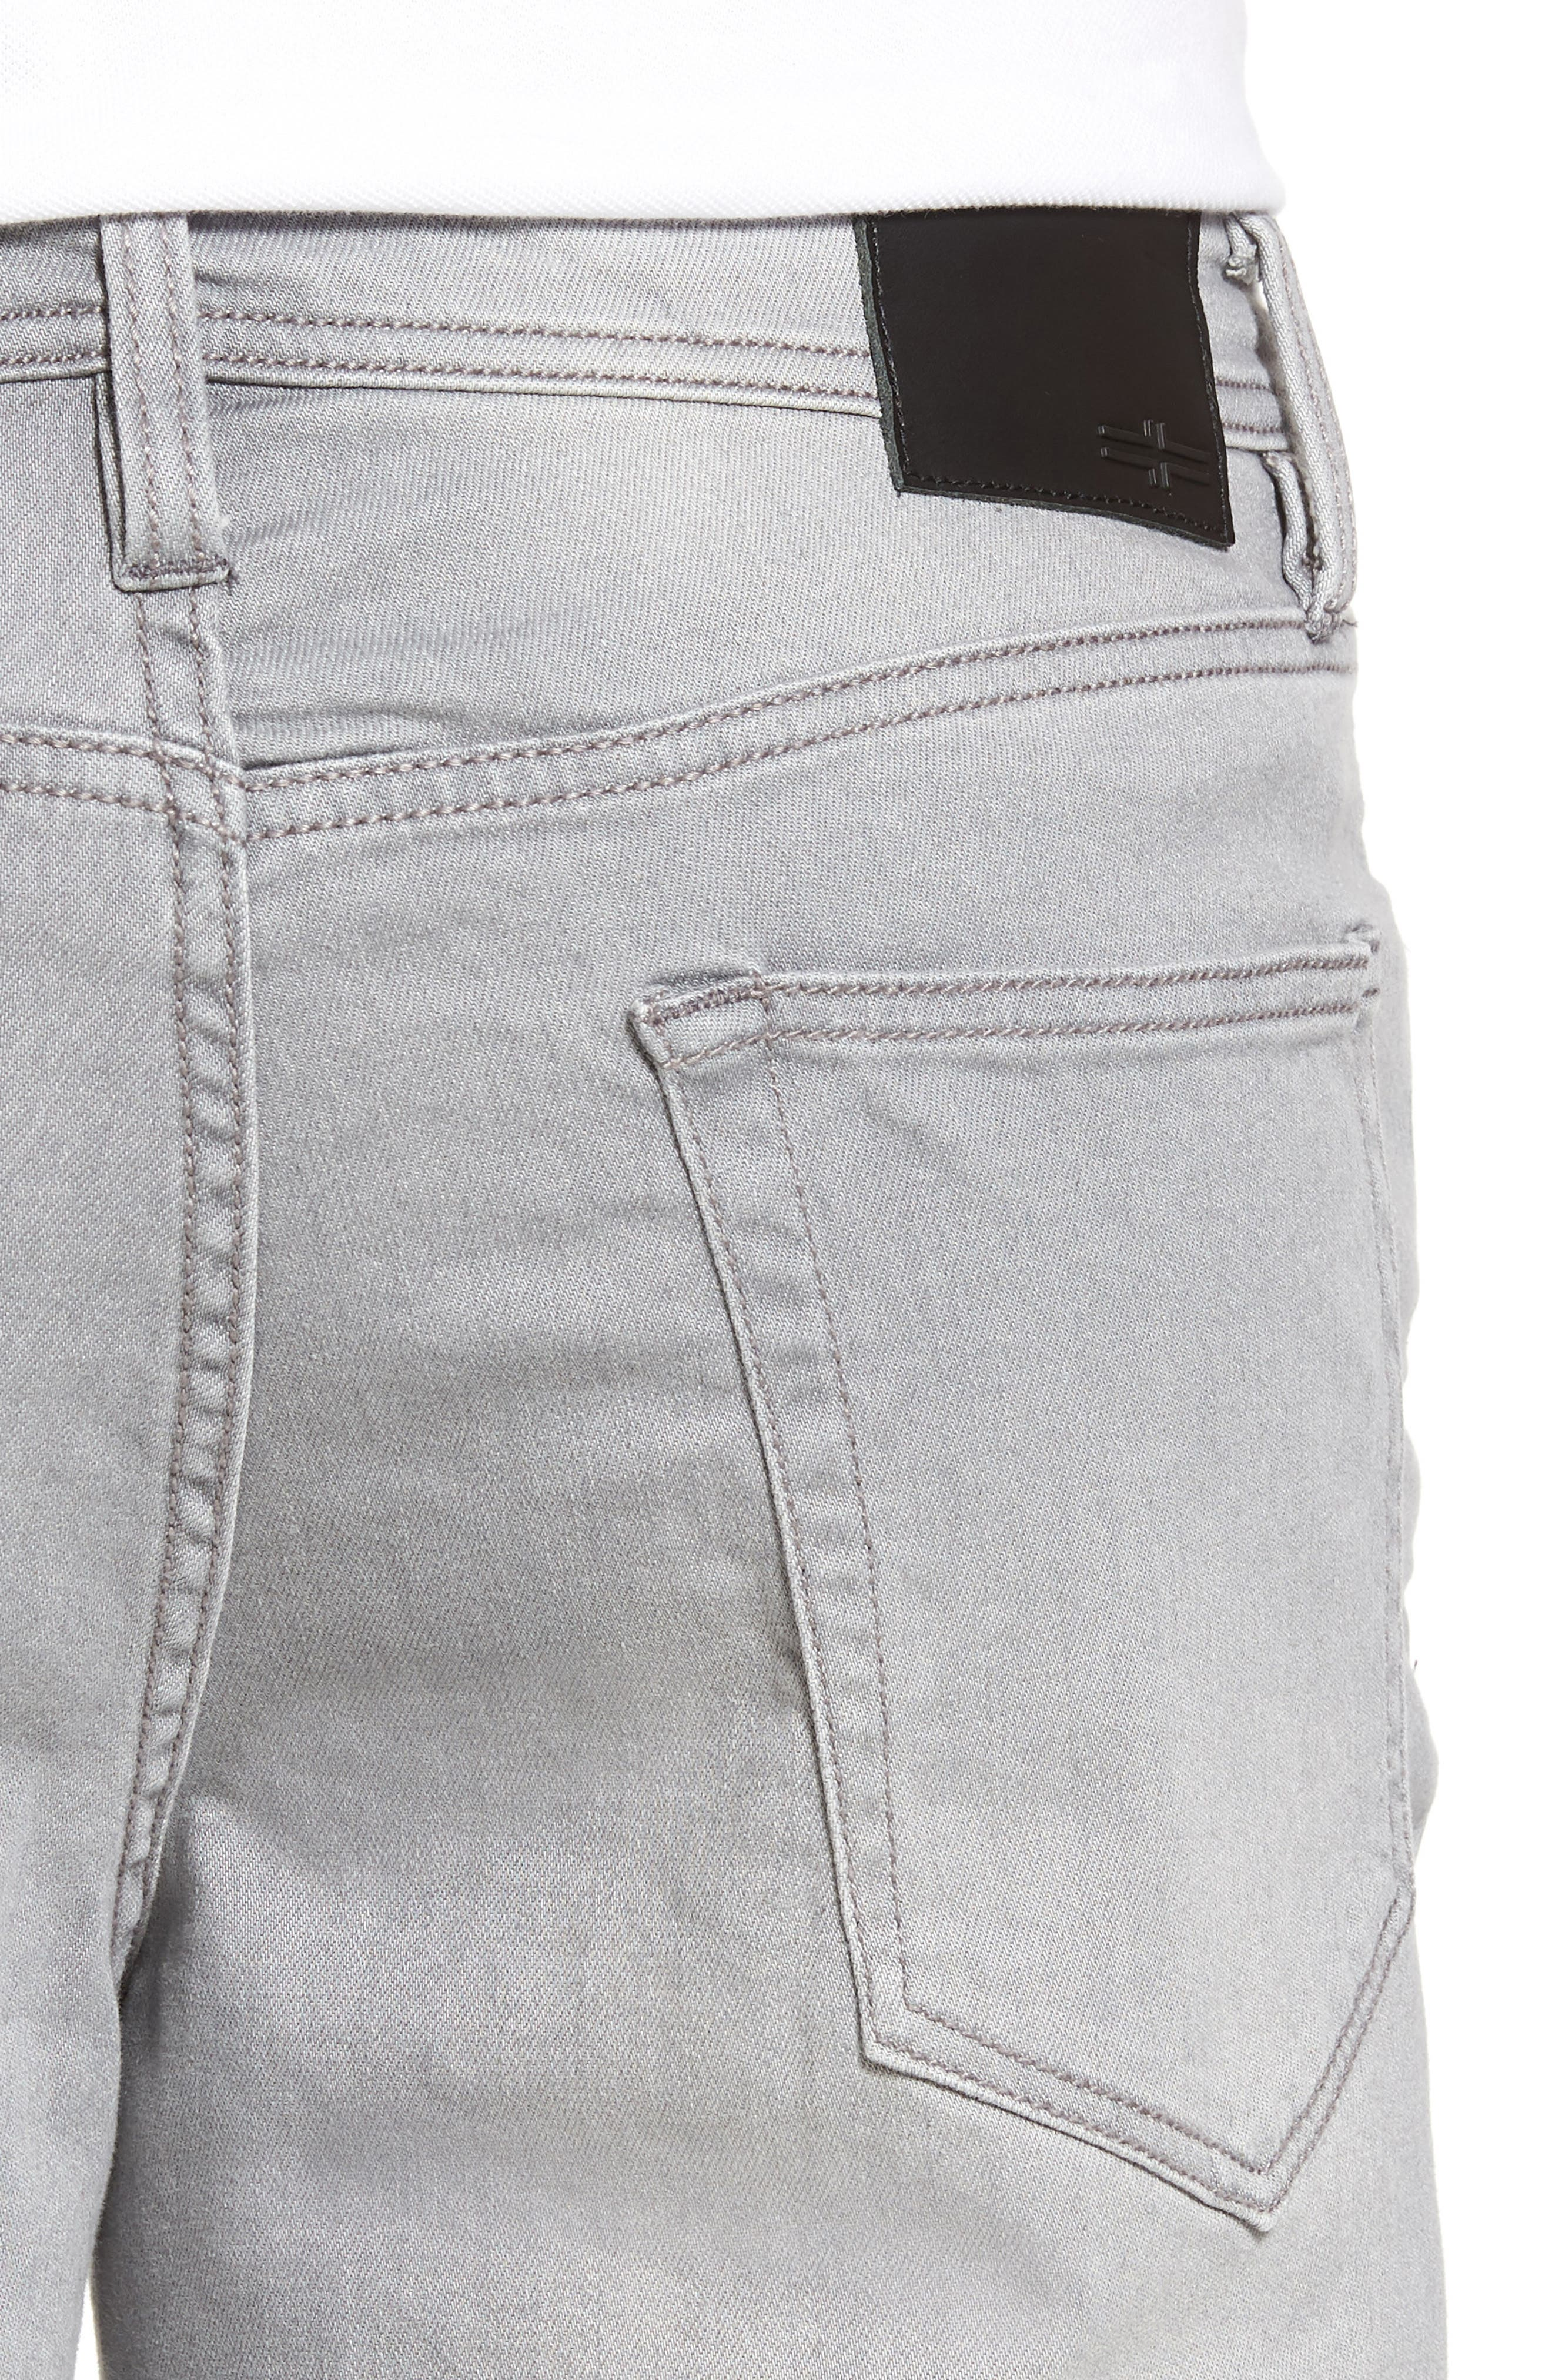 LIVERPOOL, Regent Relaxed Straight Leg Jeans, Alternate thumbnail 4, color, COAL MINE DARK